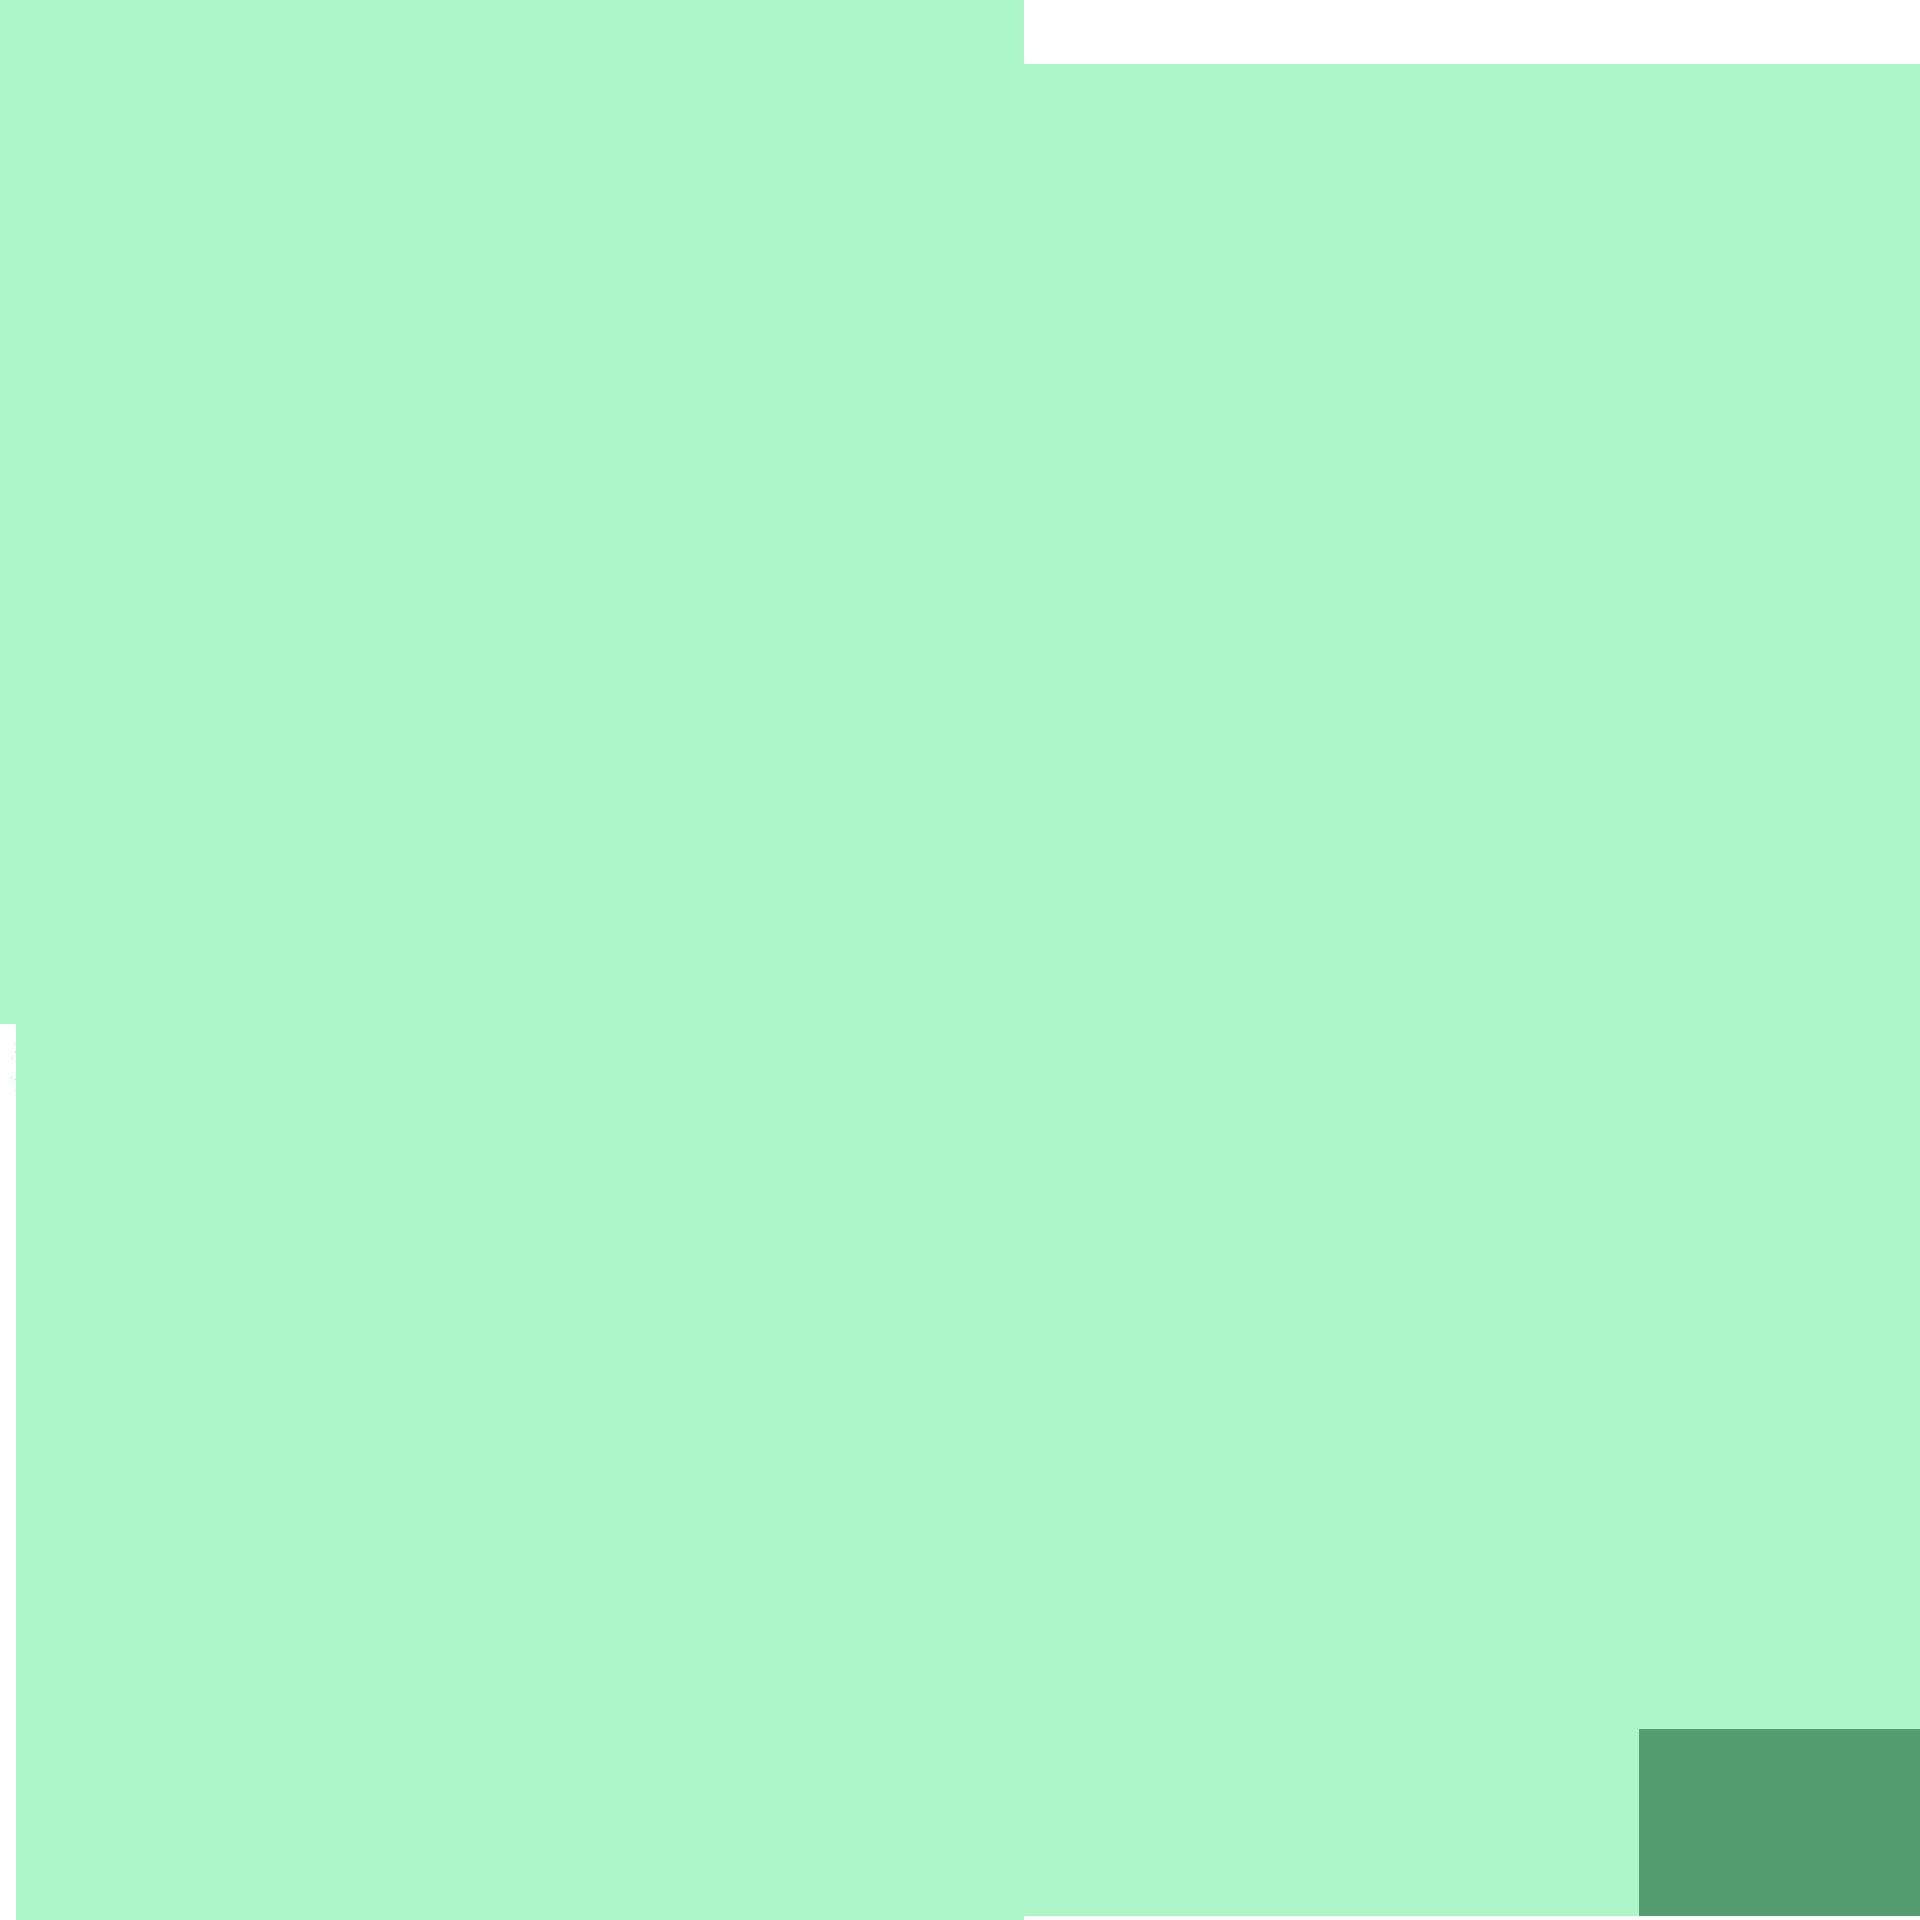 w14_03_porsche_p1_blueprint